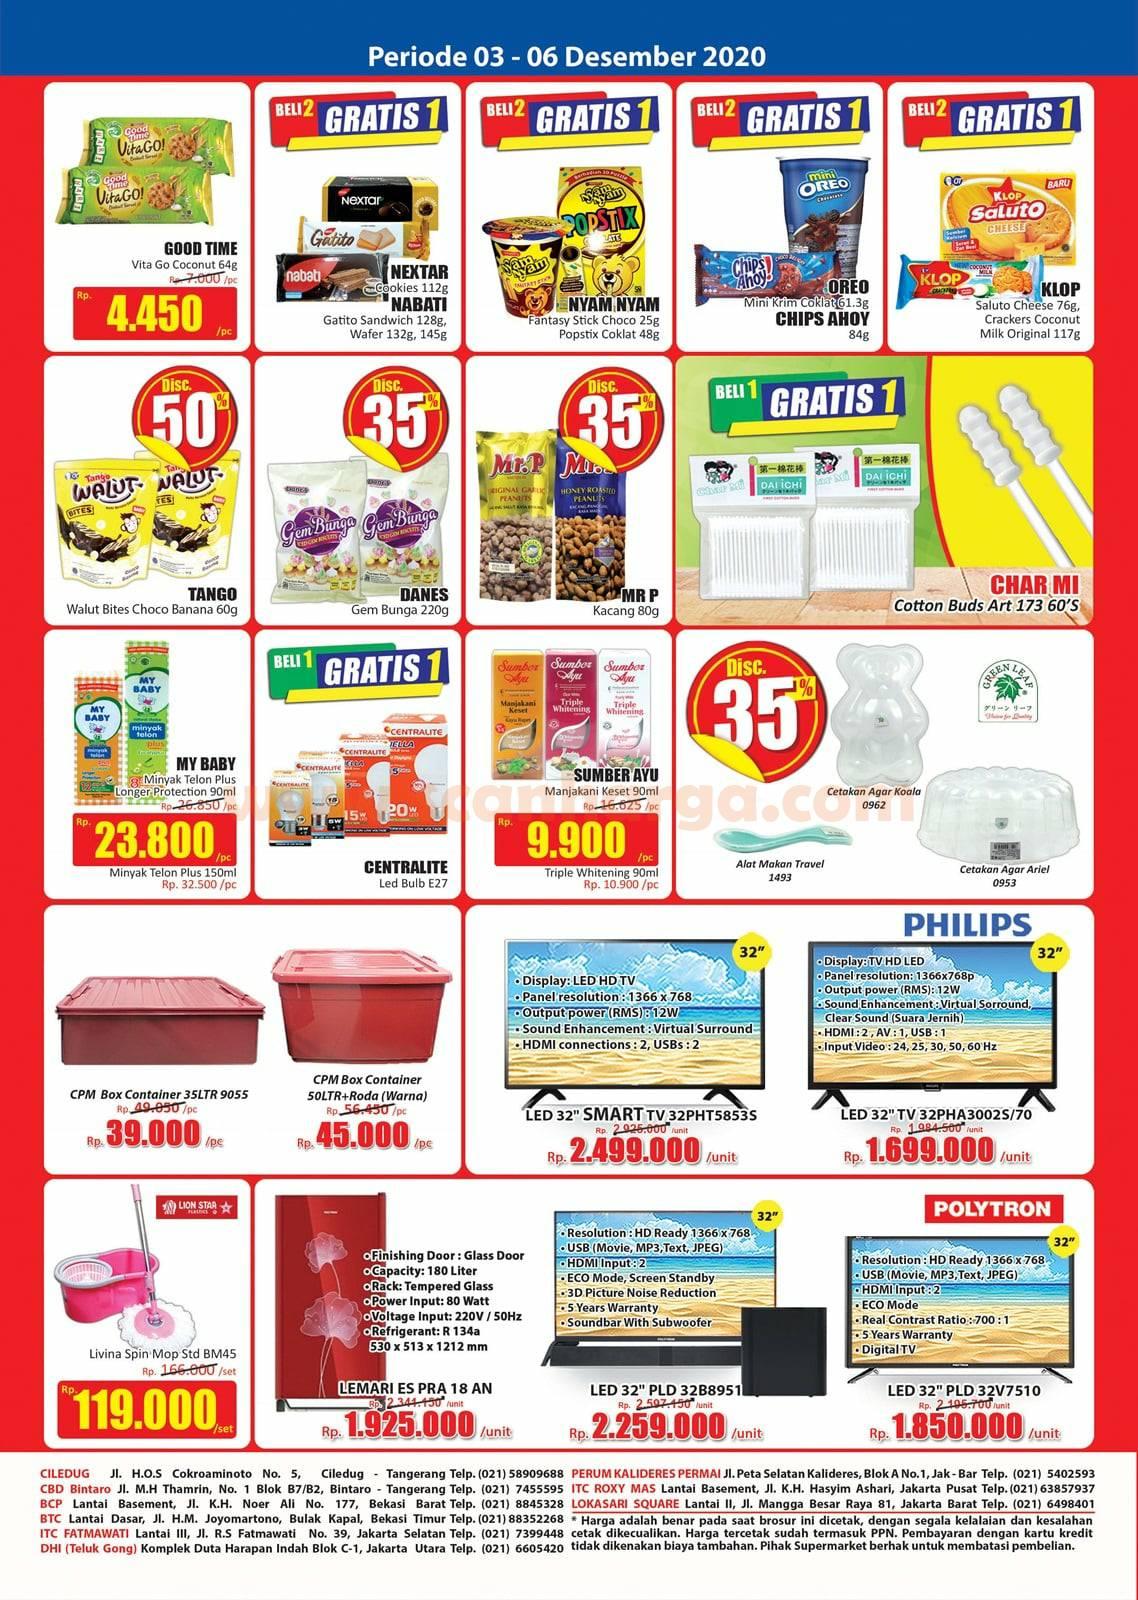 Katalog Promo JSM Hari Hari Swalayan Weekend 3 - 6 Desember 2020 4